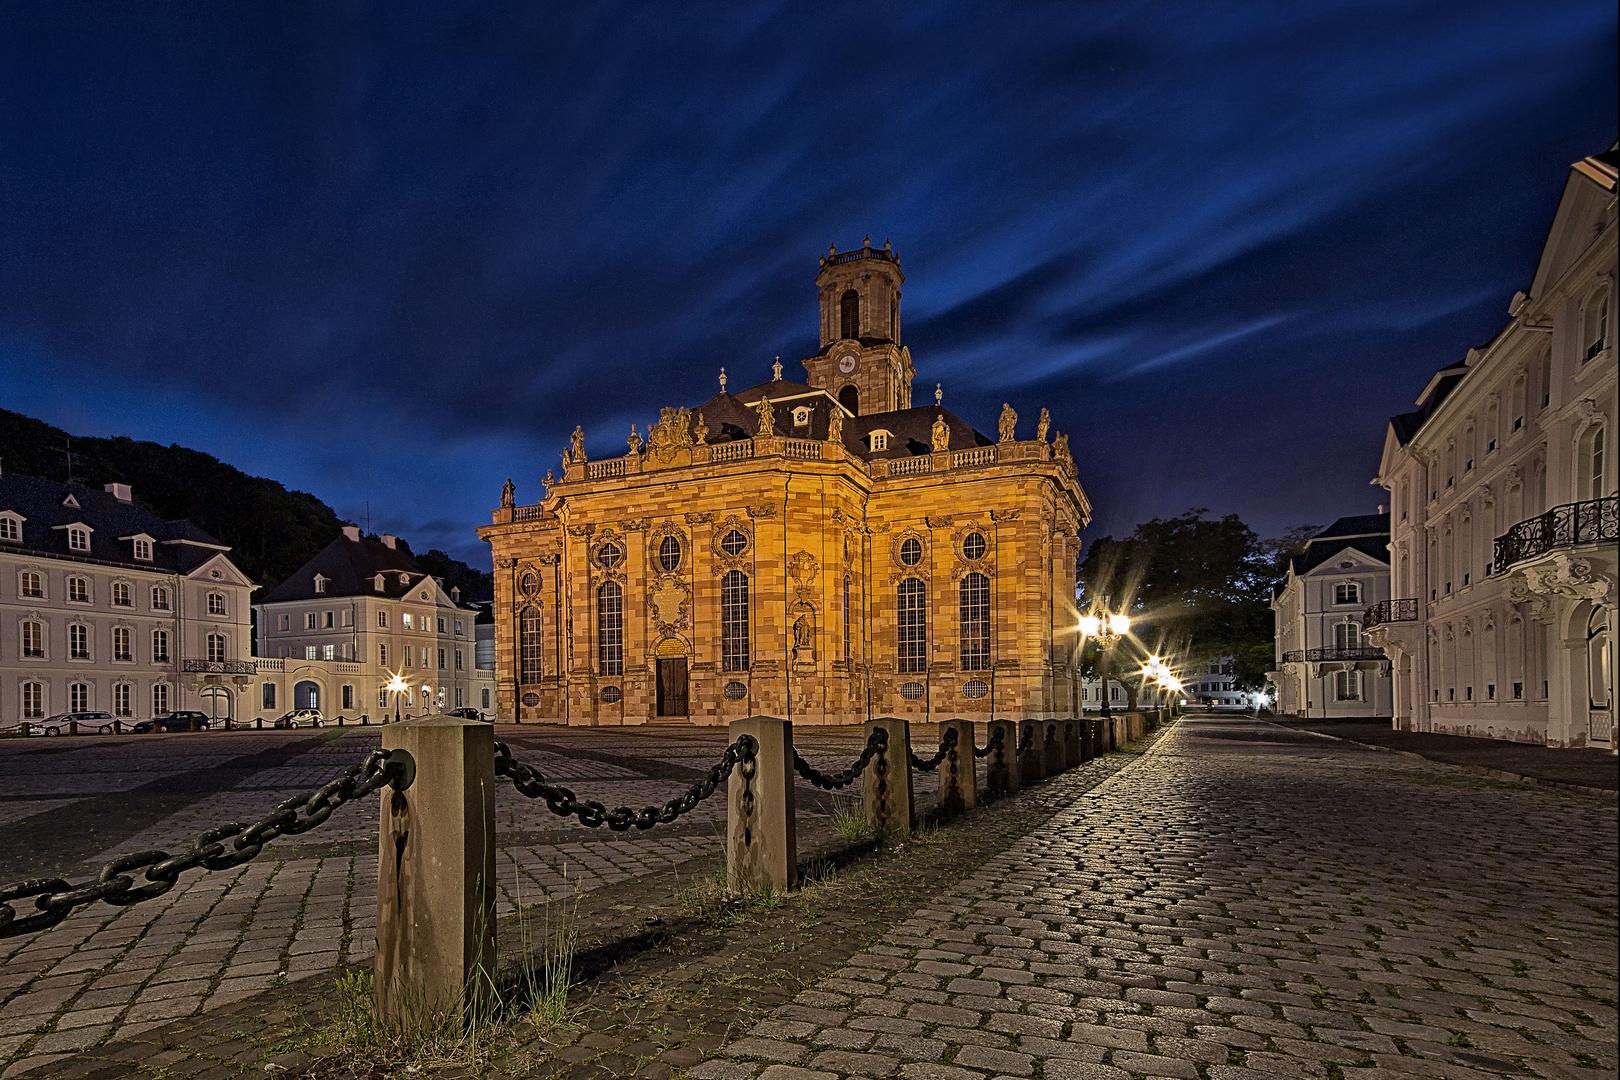 Saarbrücker Ludwigskirche